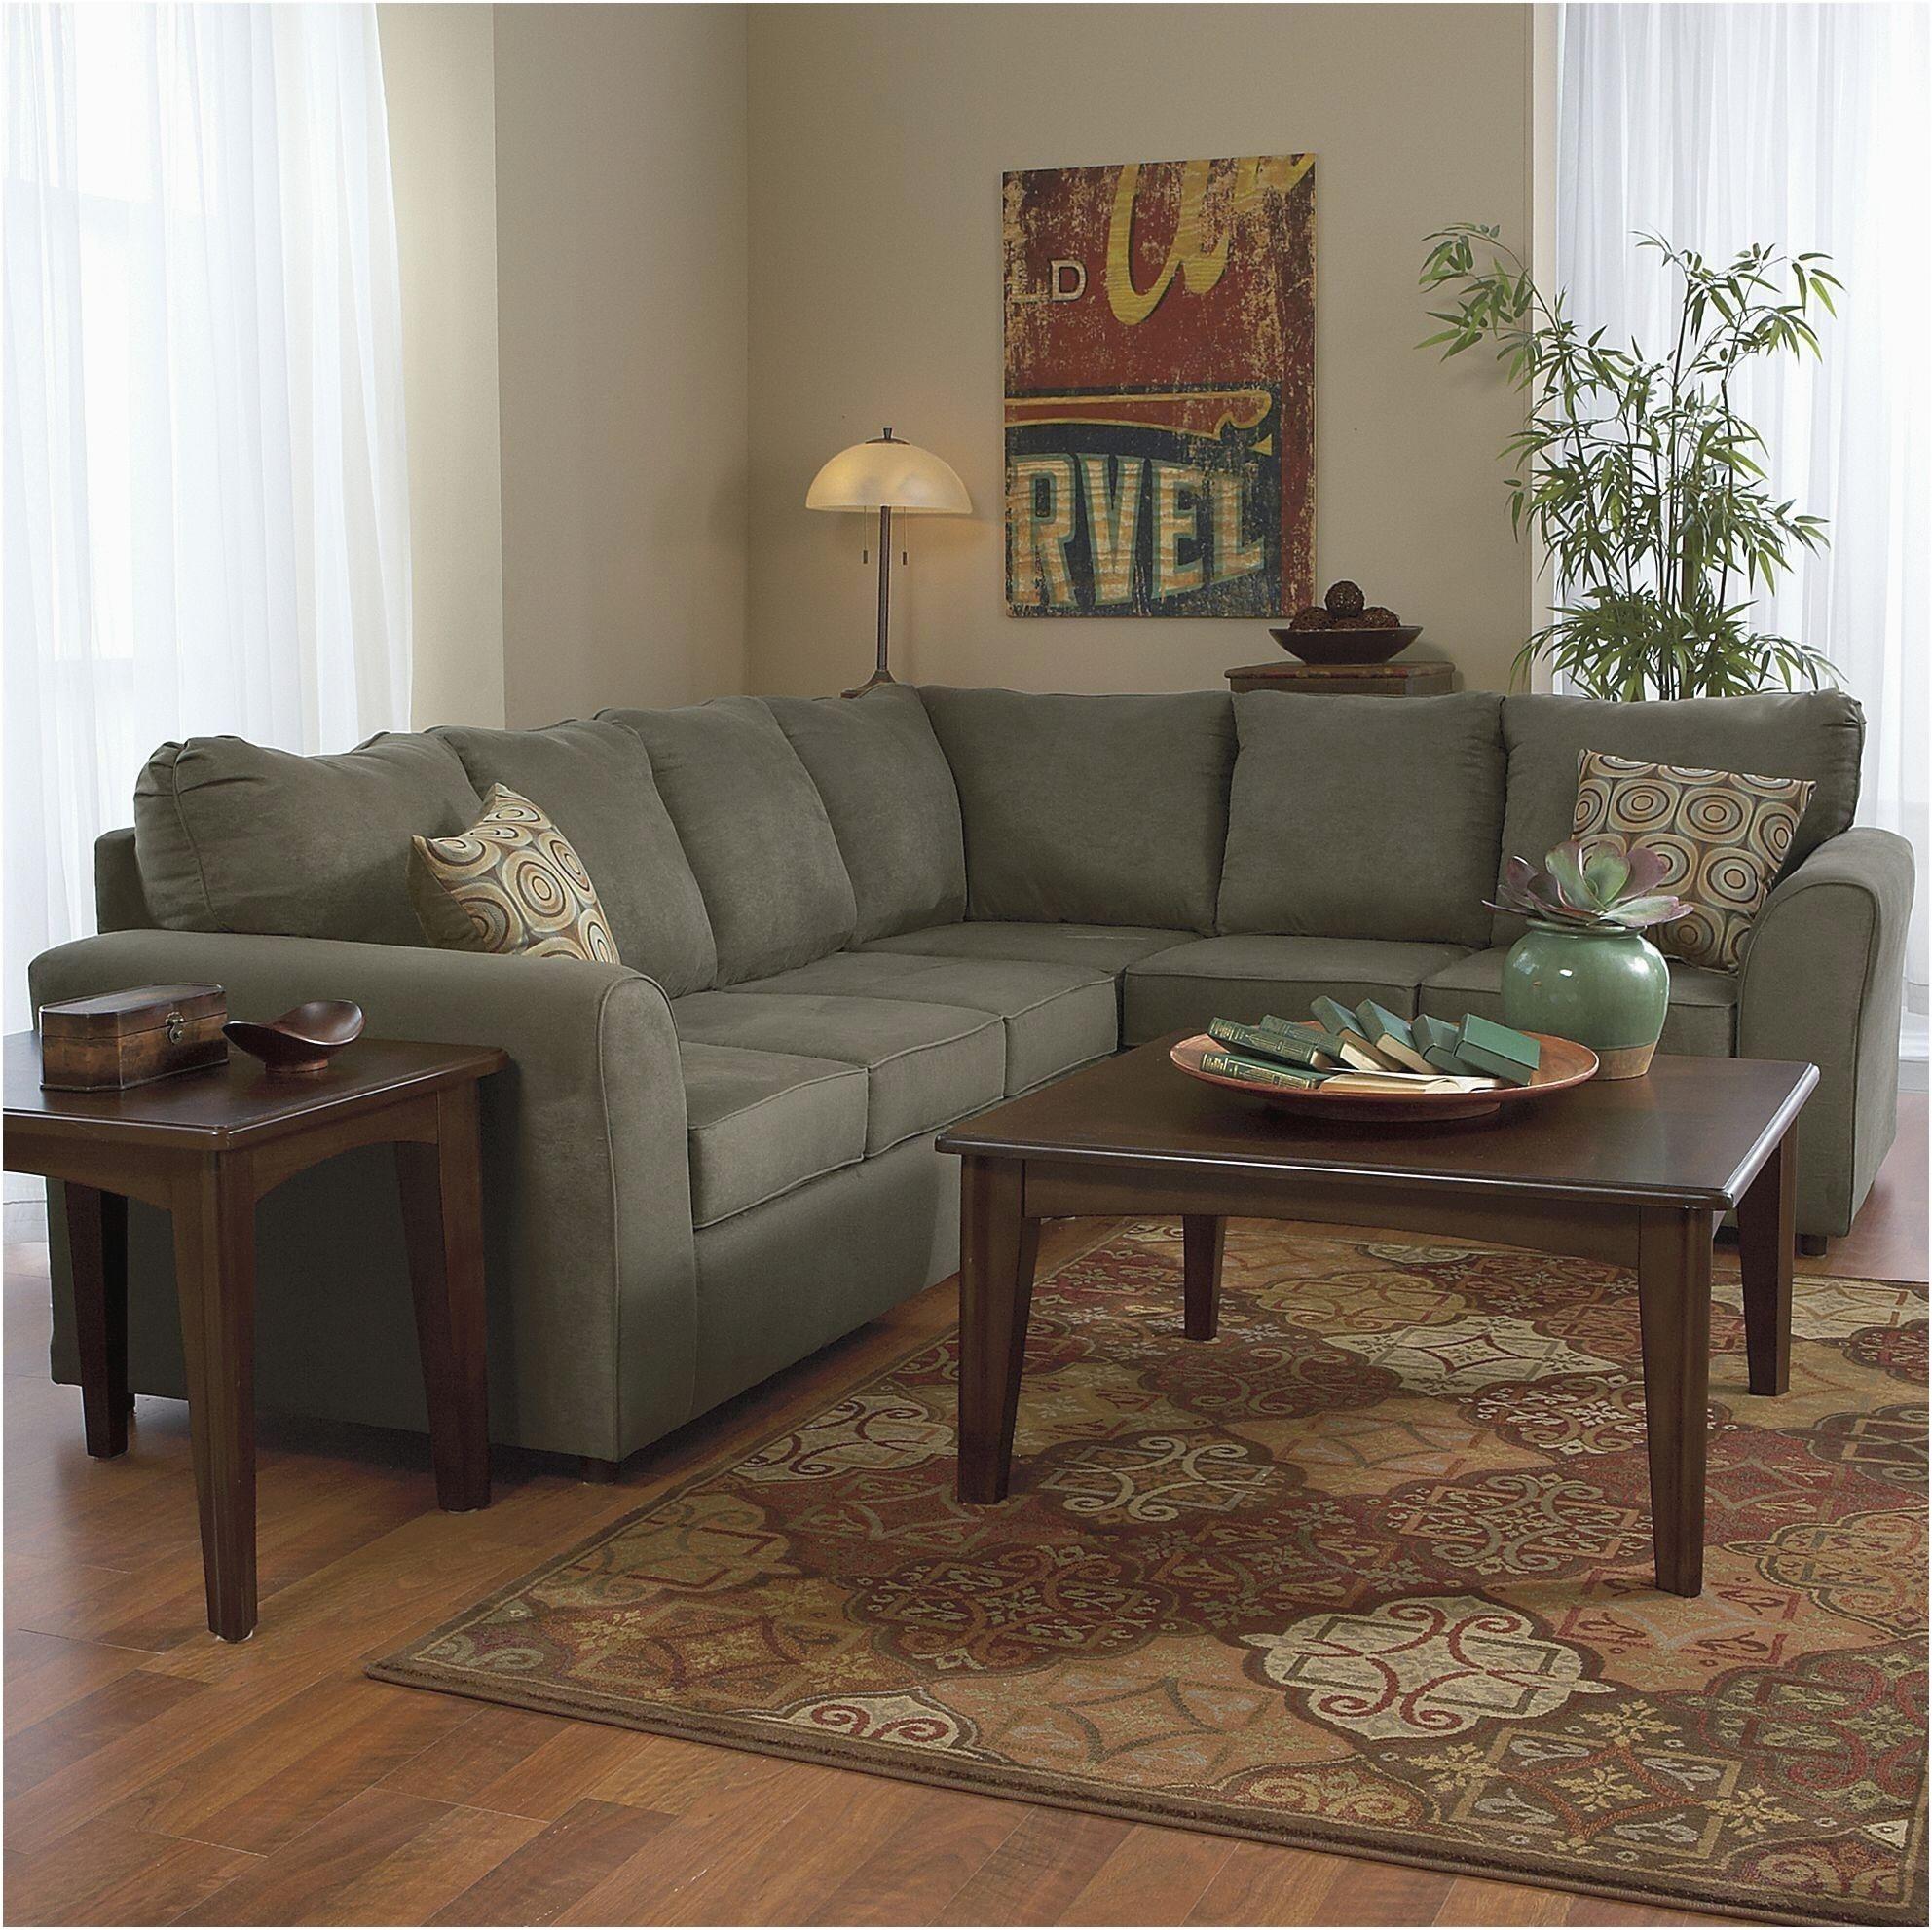 home design sectional sofas under 500 best deals patio furniture graceful wicker outdoor sofa 0d